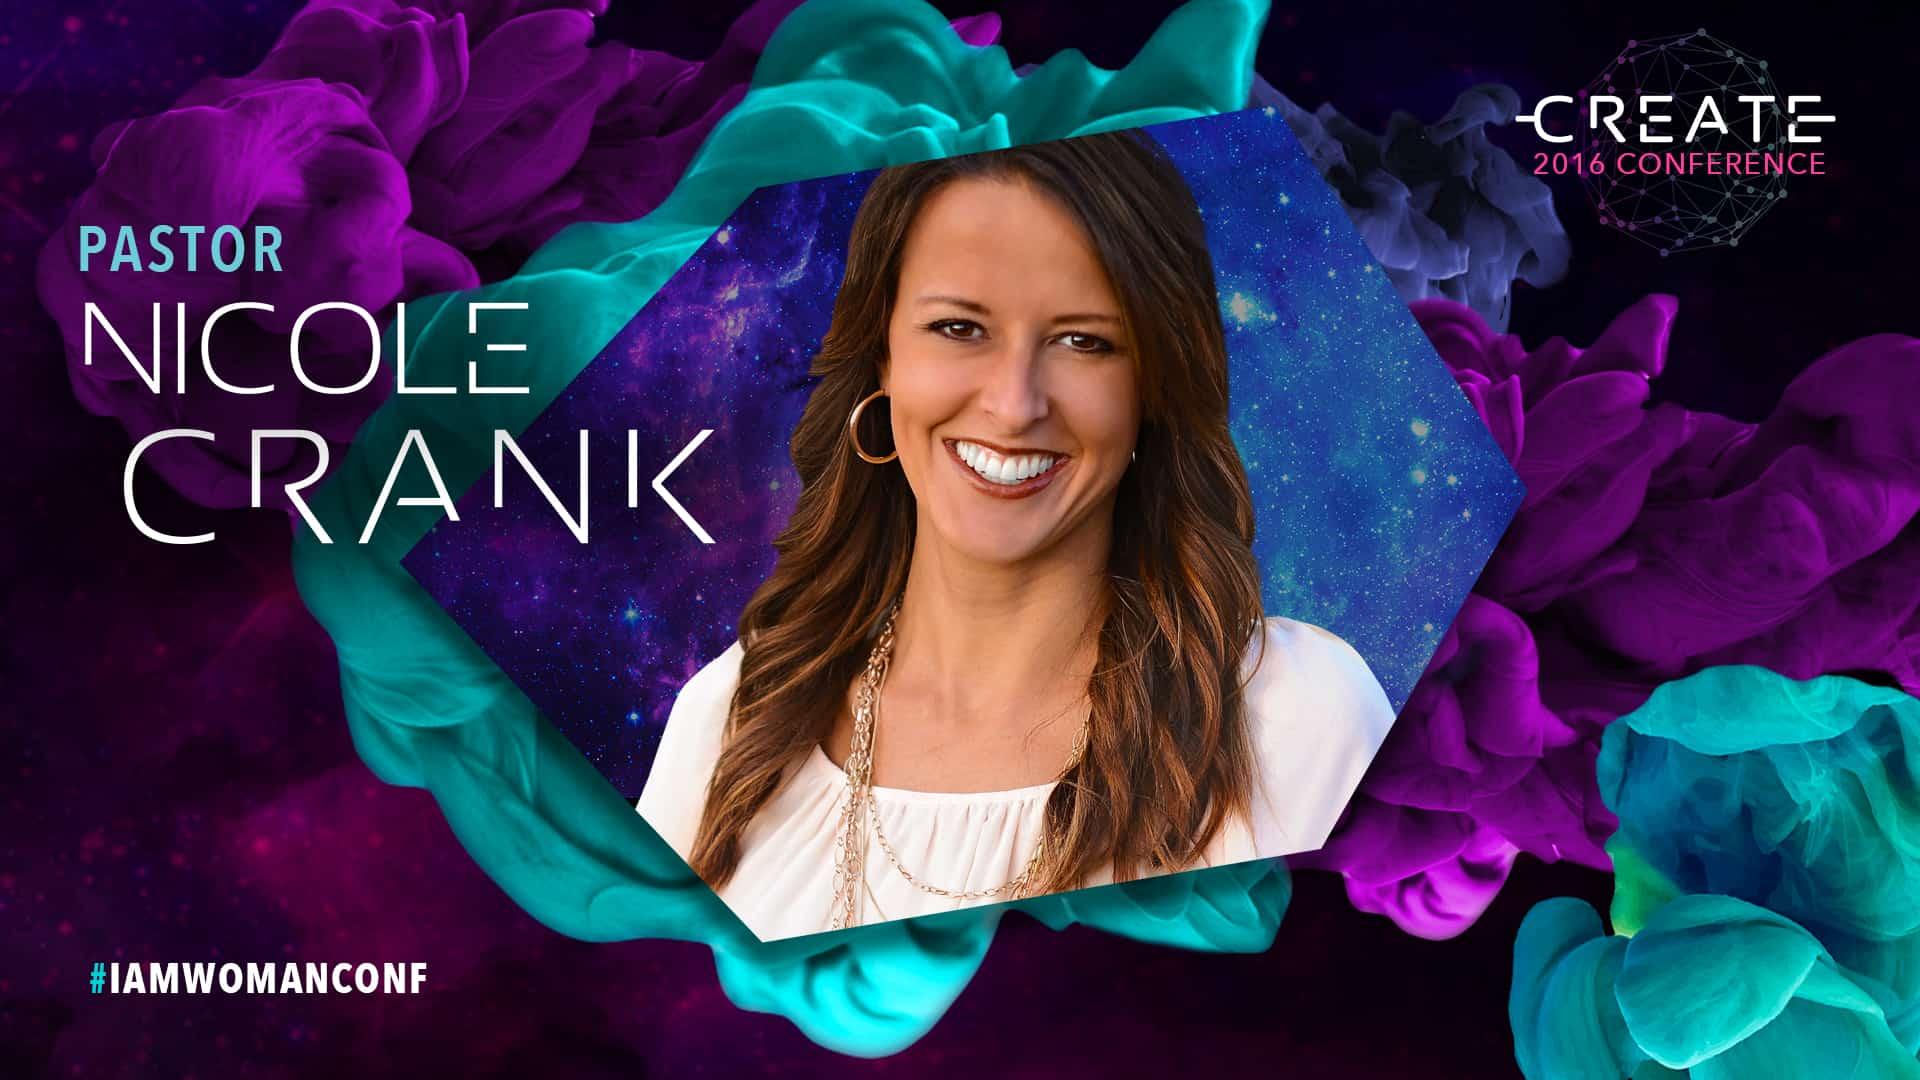 Nicole Crank - CREATE